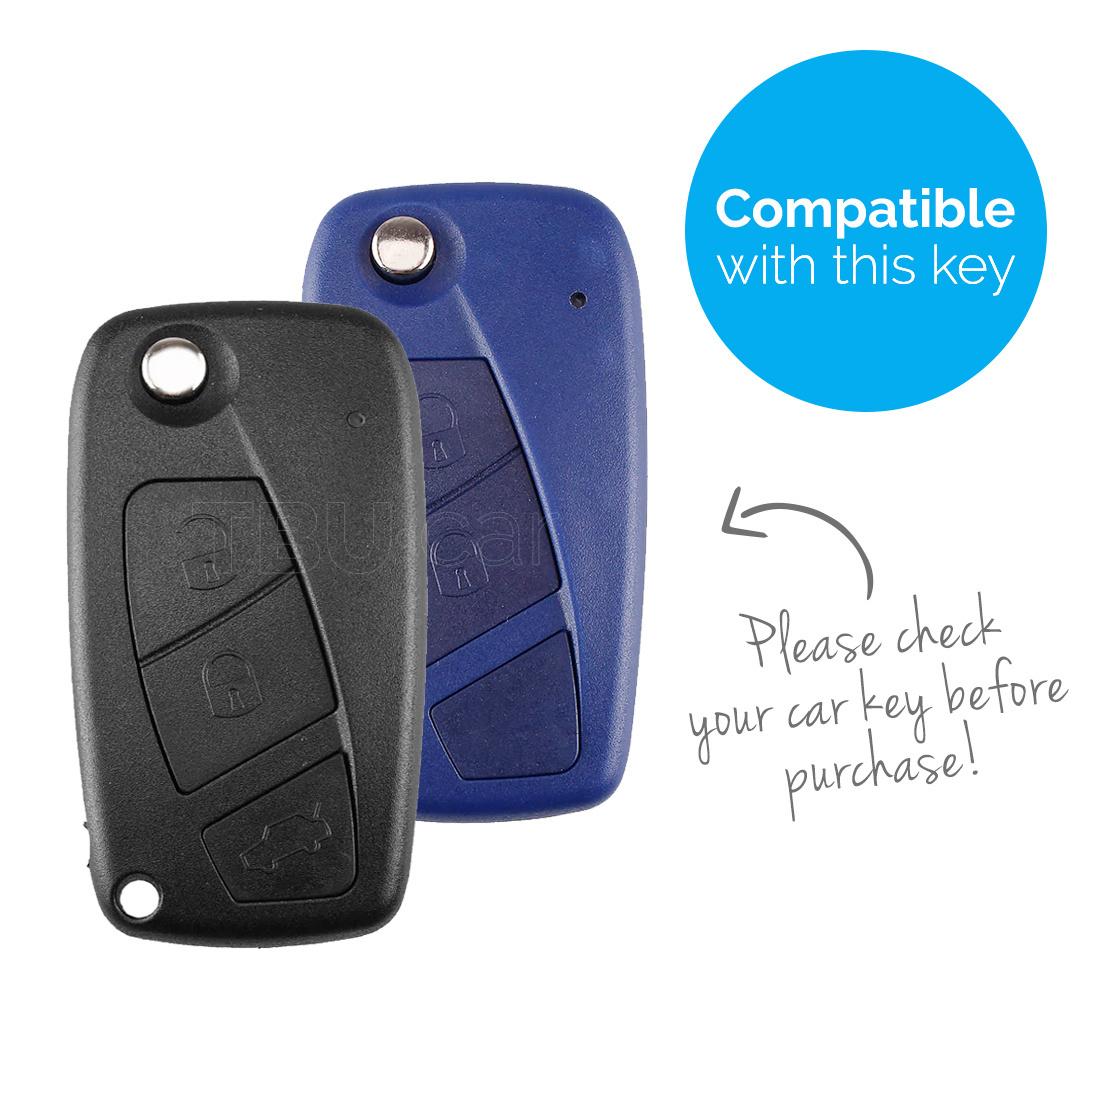 TBU car Autoschlüssel Hülle für Fiat 3 Tasten - Schutzhülle aus Silikon - Auto Schlüsselhülle Cover in Rosa